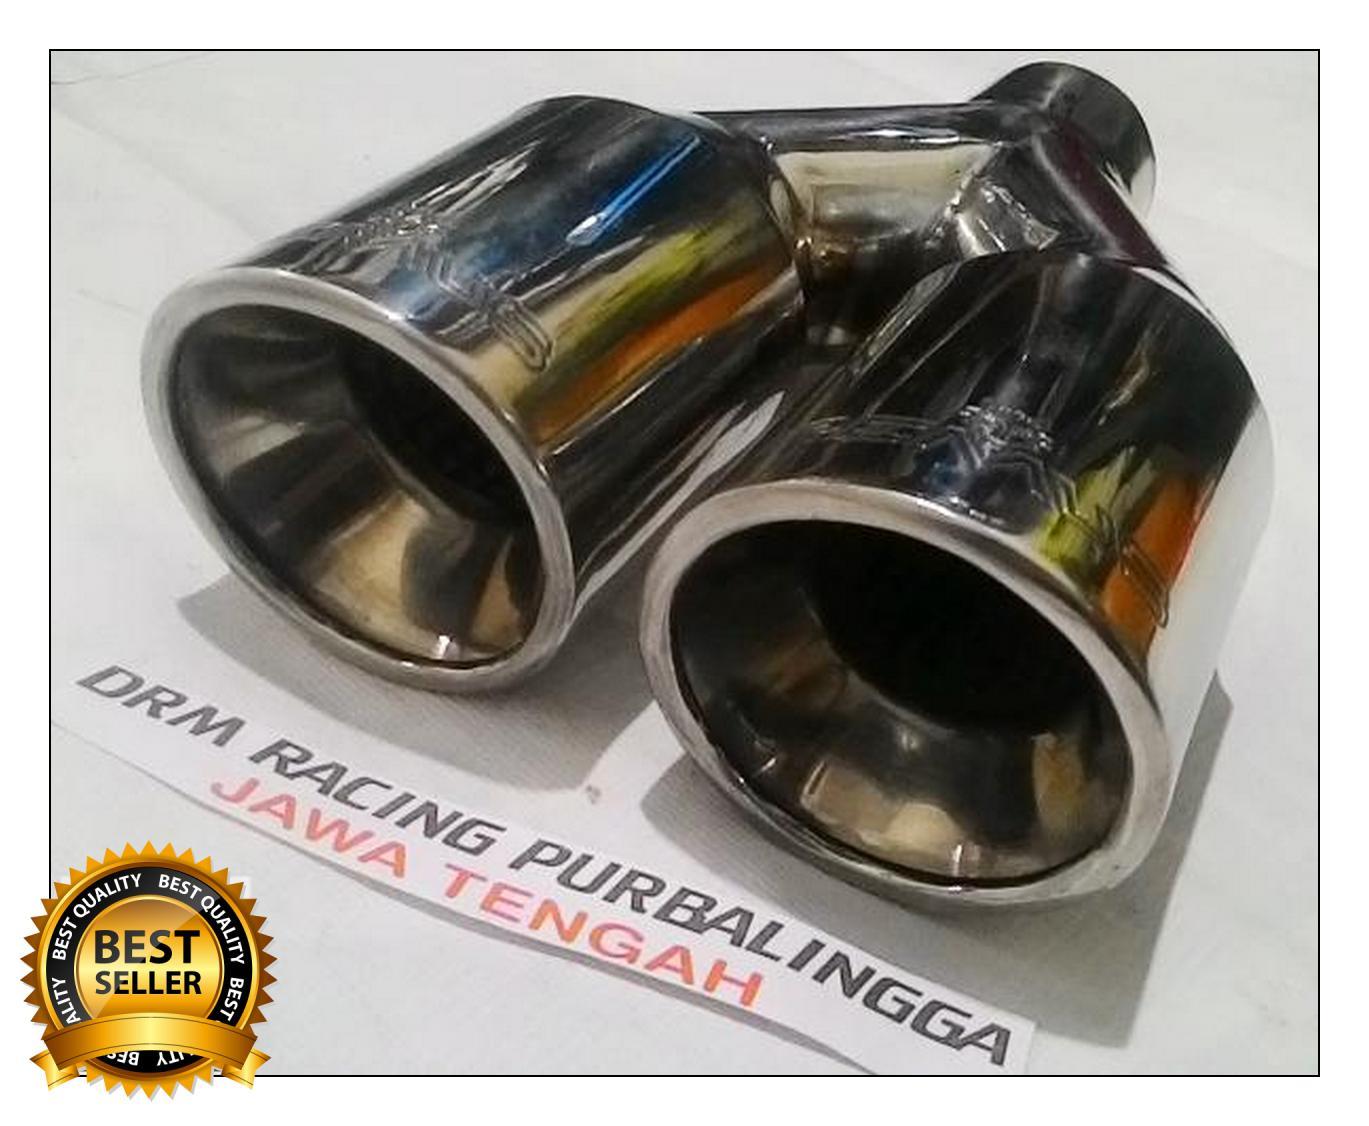 Fitur Knalpot Mobil Racing Remus Cabang Sporty Agya Ayla Brio Wagon Muffler Js R Avanza Xenia Escudo Universal Semua